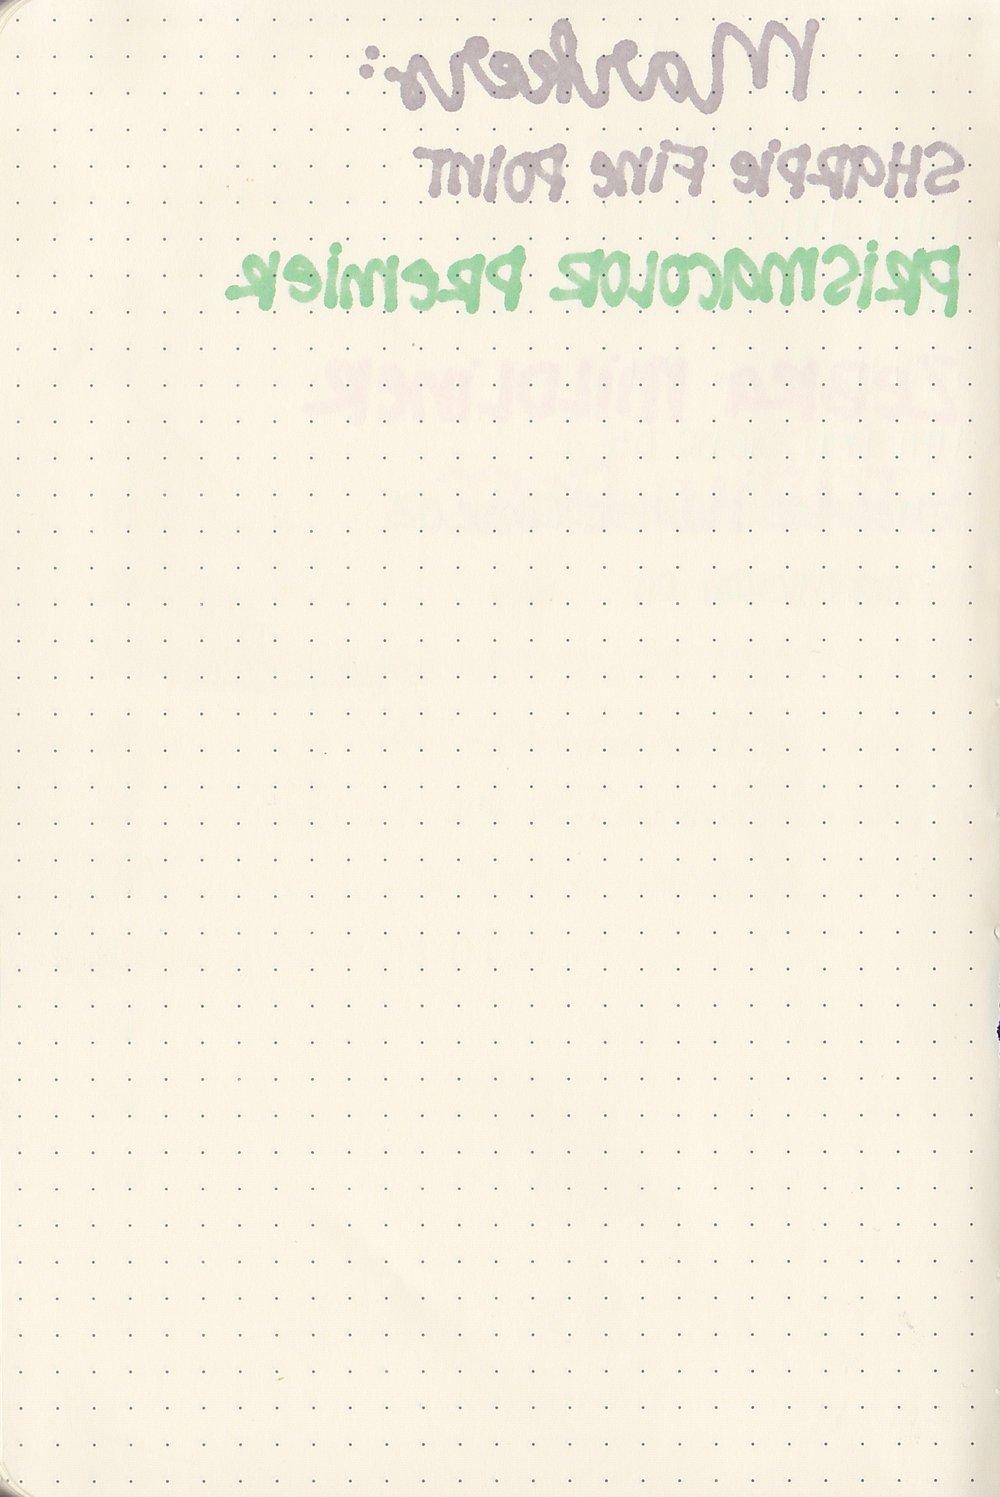 RhodiaWebnotebook2 - 4.jpg